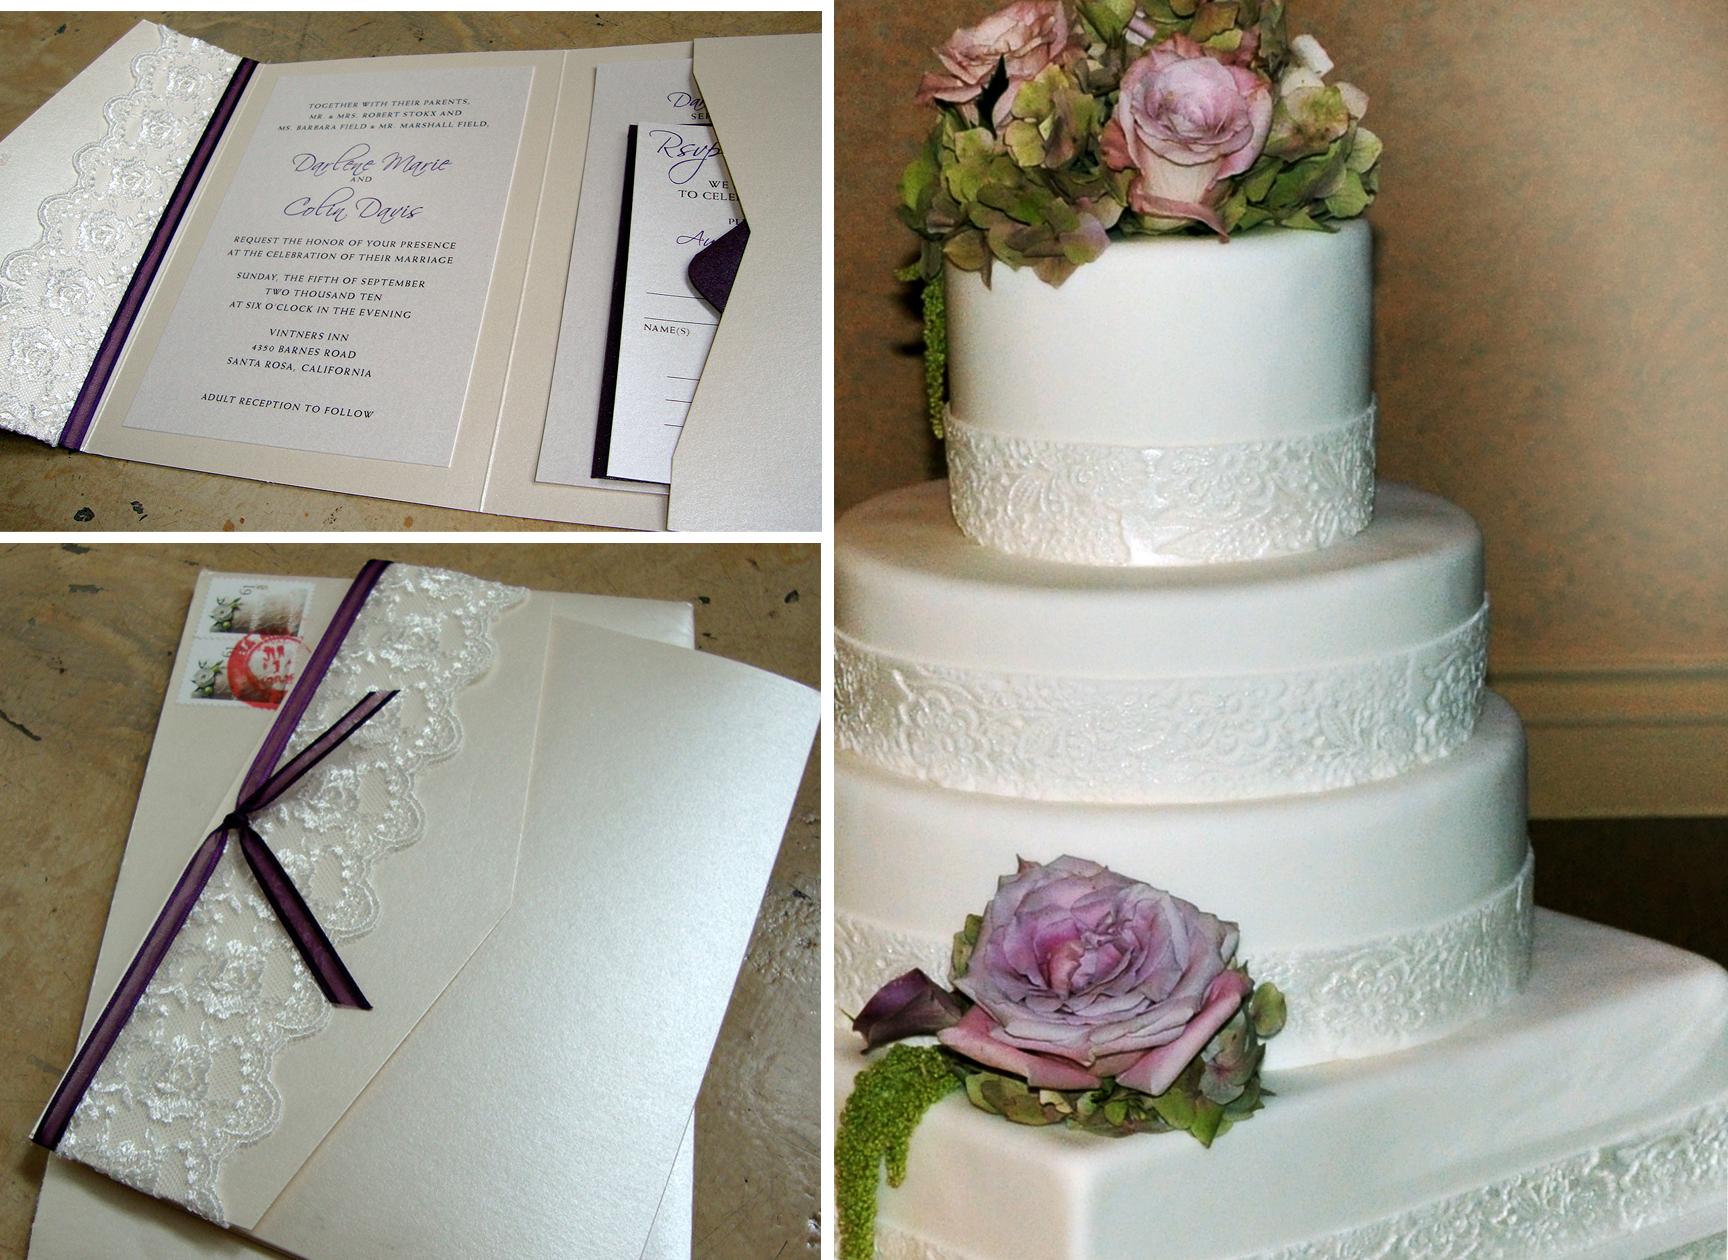 wedding cake invite Darlene my creative 39DIY 39 friend sent me a sample